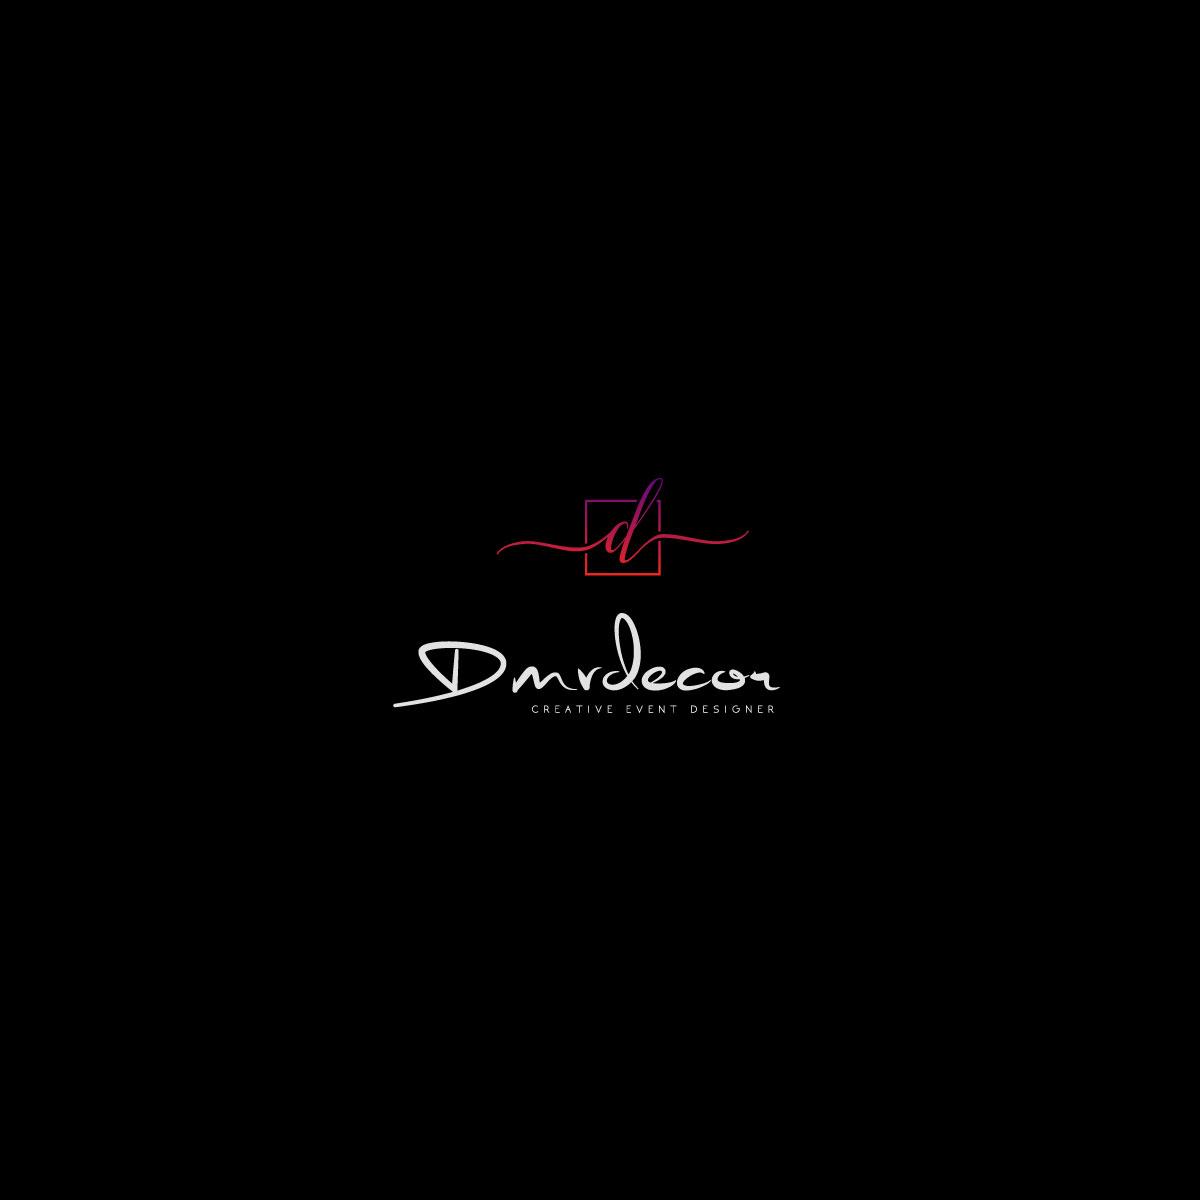 Logo Design by M h Rubel - Entry No. 87 in the Logo Design Contest dmvdecor Logo Design.